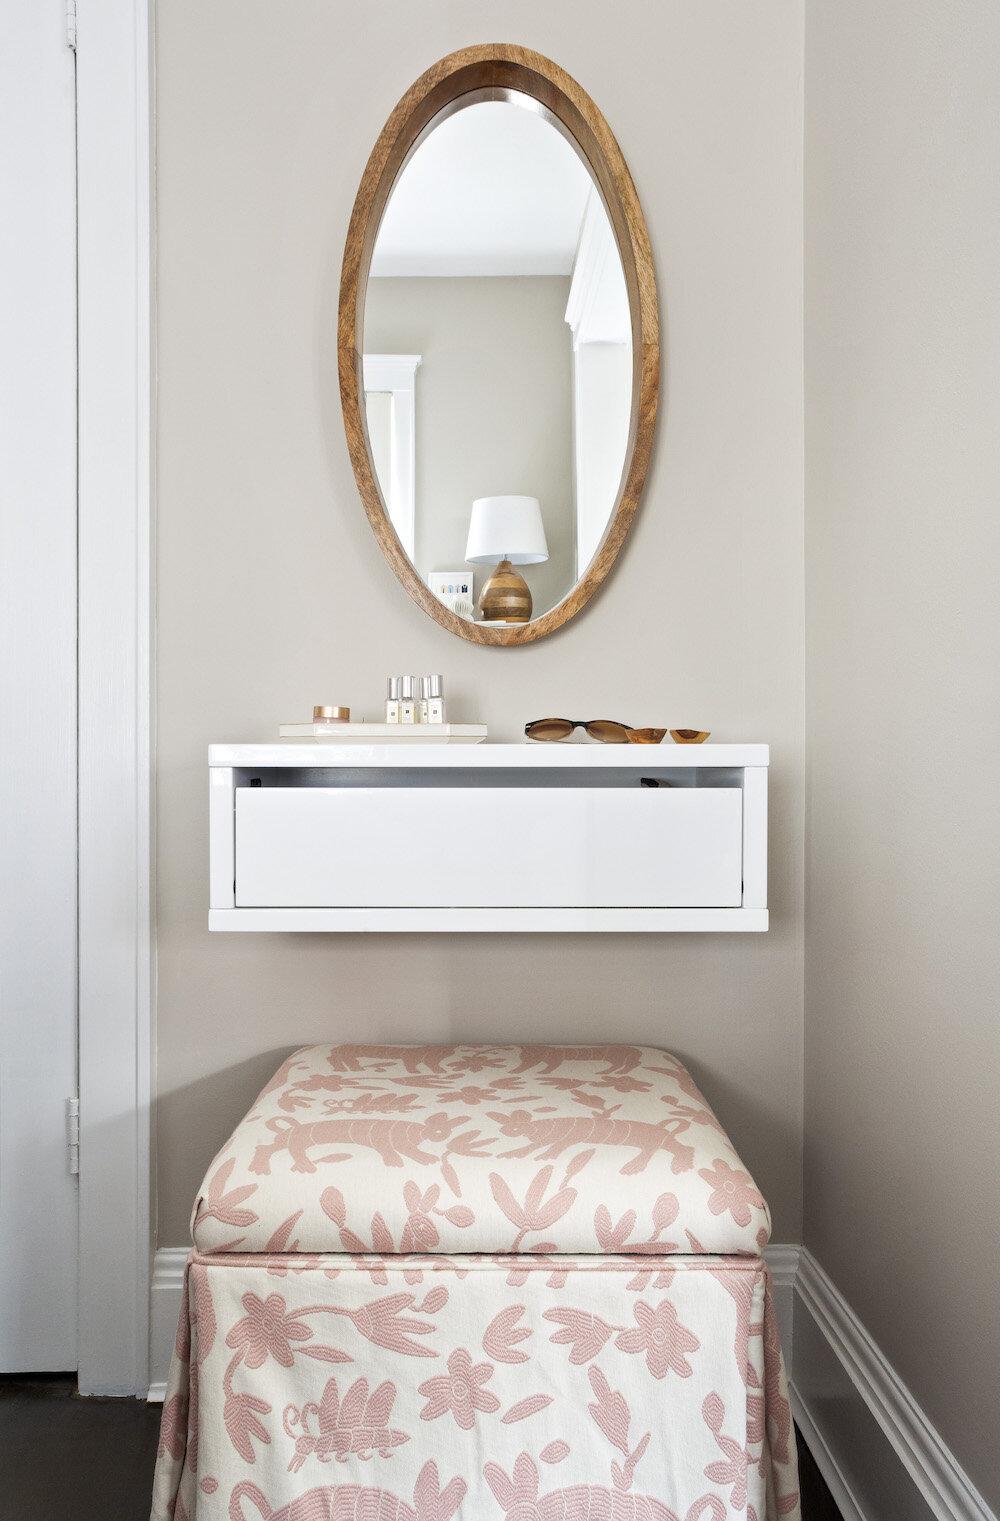 bedroom-pop-of-color-tc-interiors-3.jpg